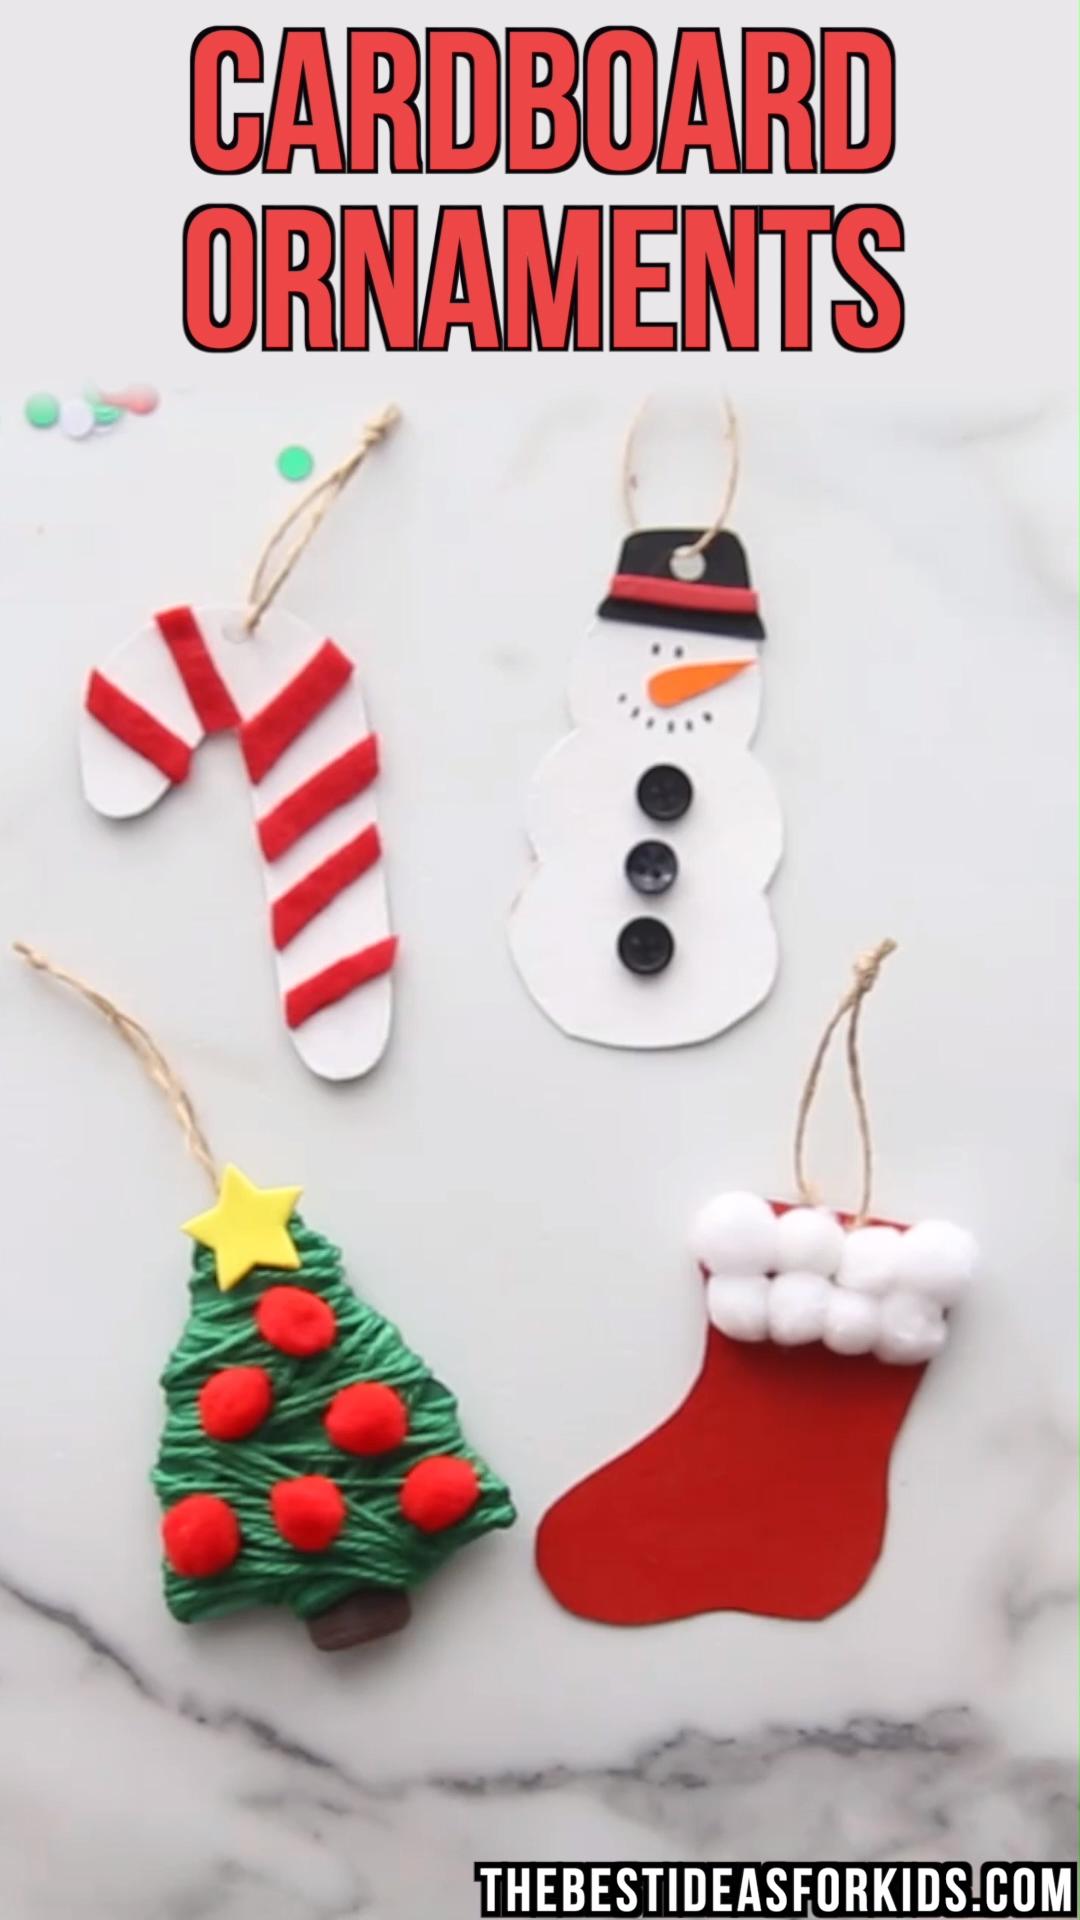 CARDBOARD ORNAMENTS - make a snowman, Christmas tree, candy cane or stocking cardboard ornament!